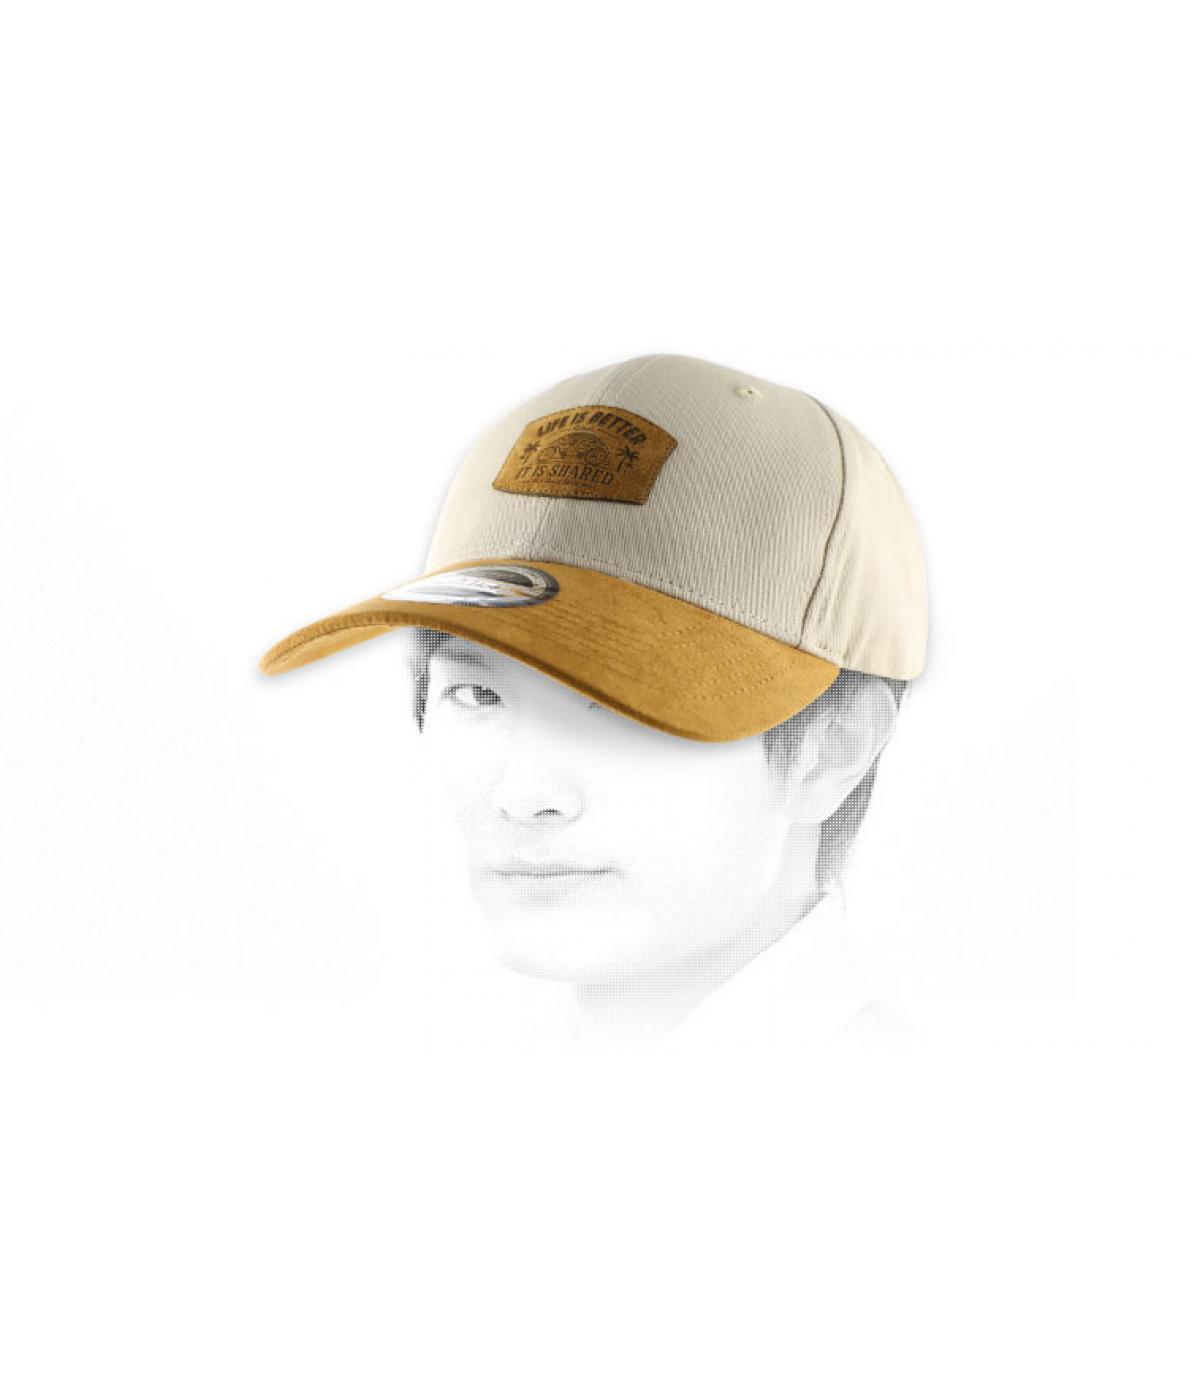 gorra curva tándem camello amarillento